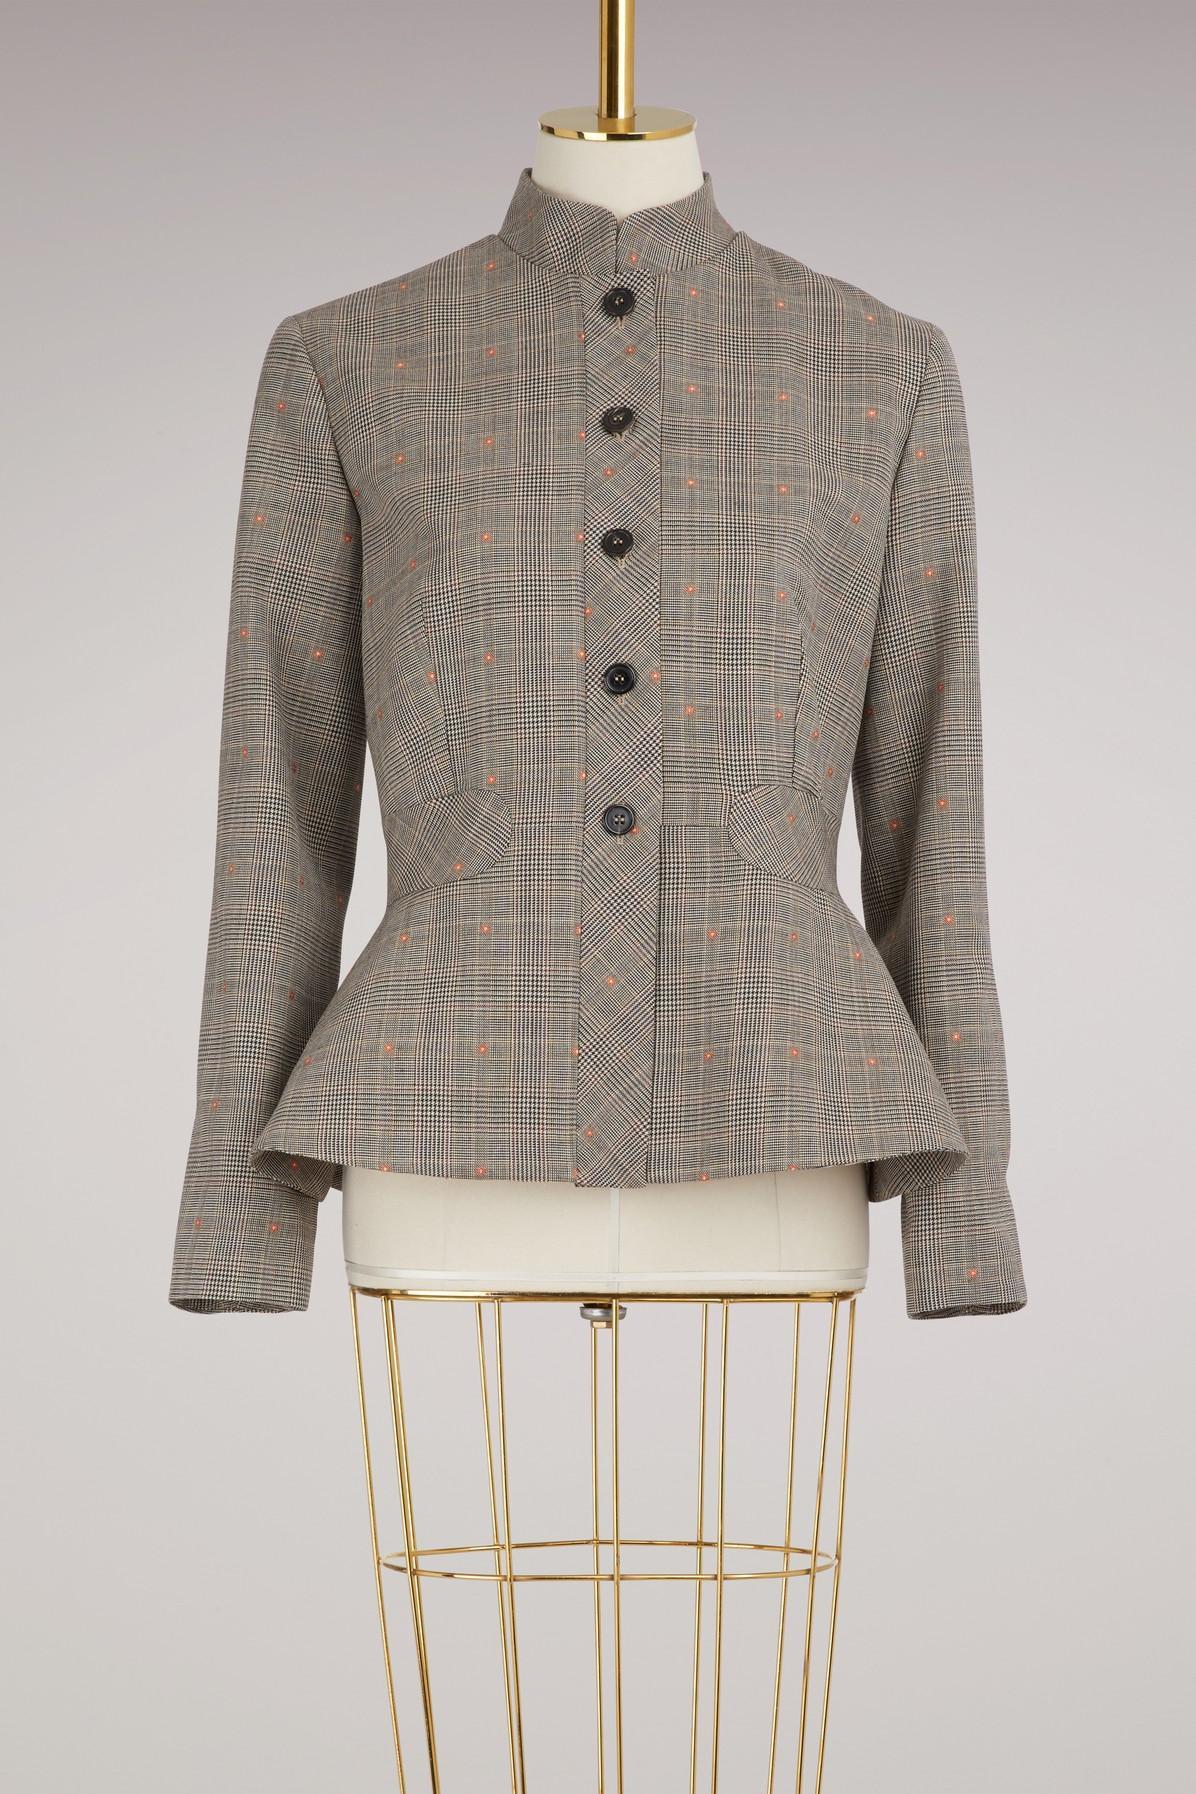 Paul & Joe Tweed Jacket In Marron